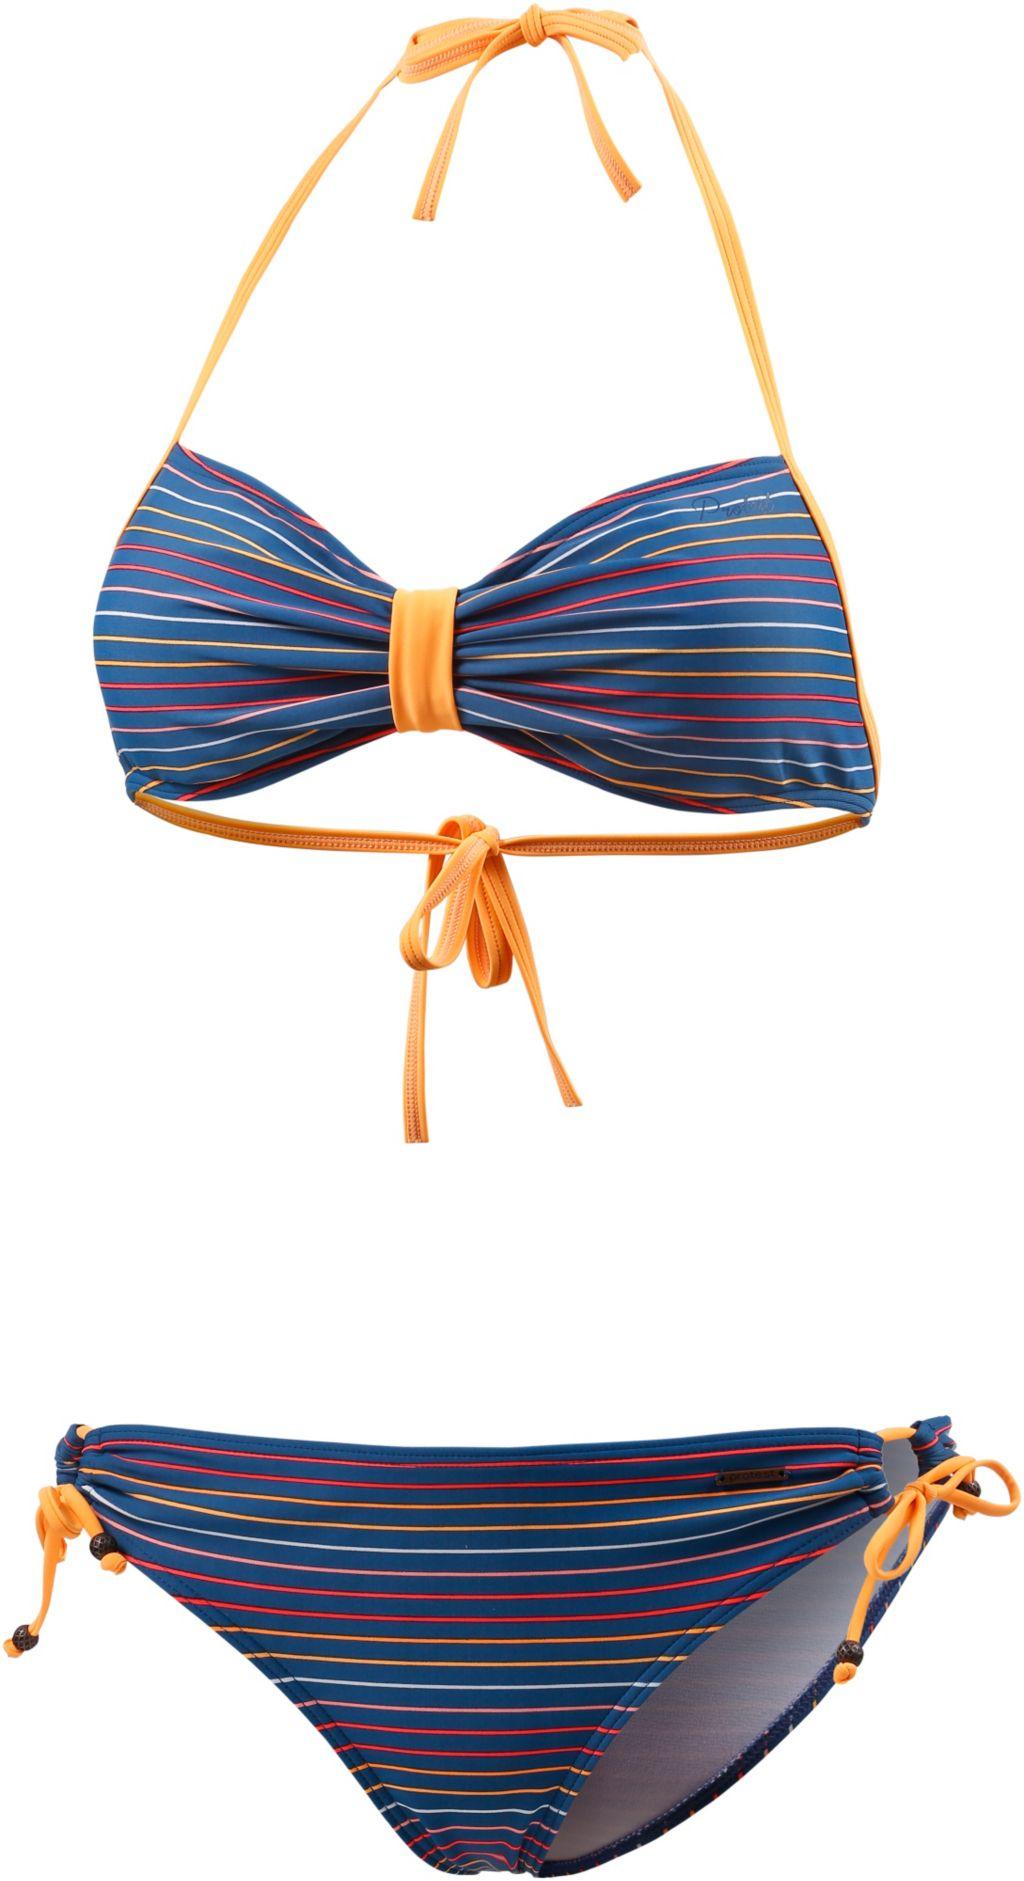 Morini Bandeau Bikini Damen in marine/papaya, Größe XL